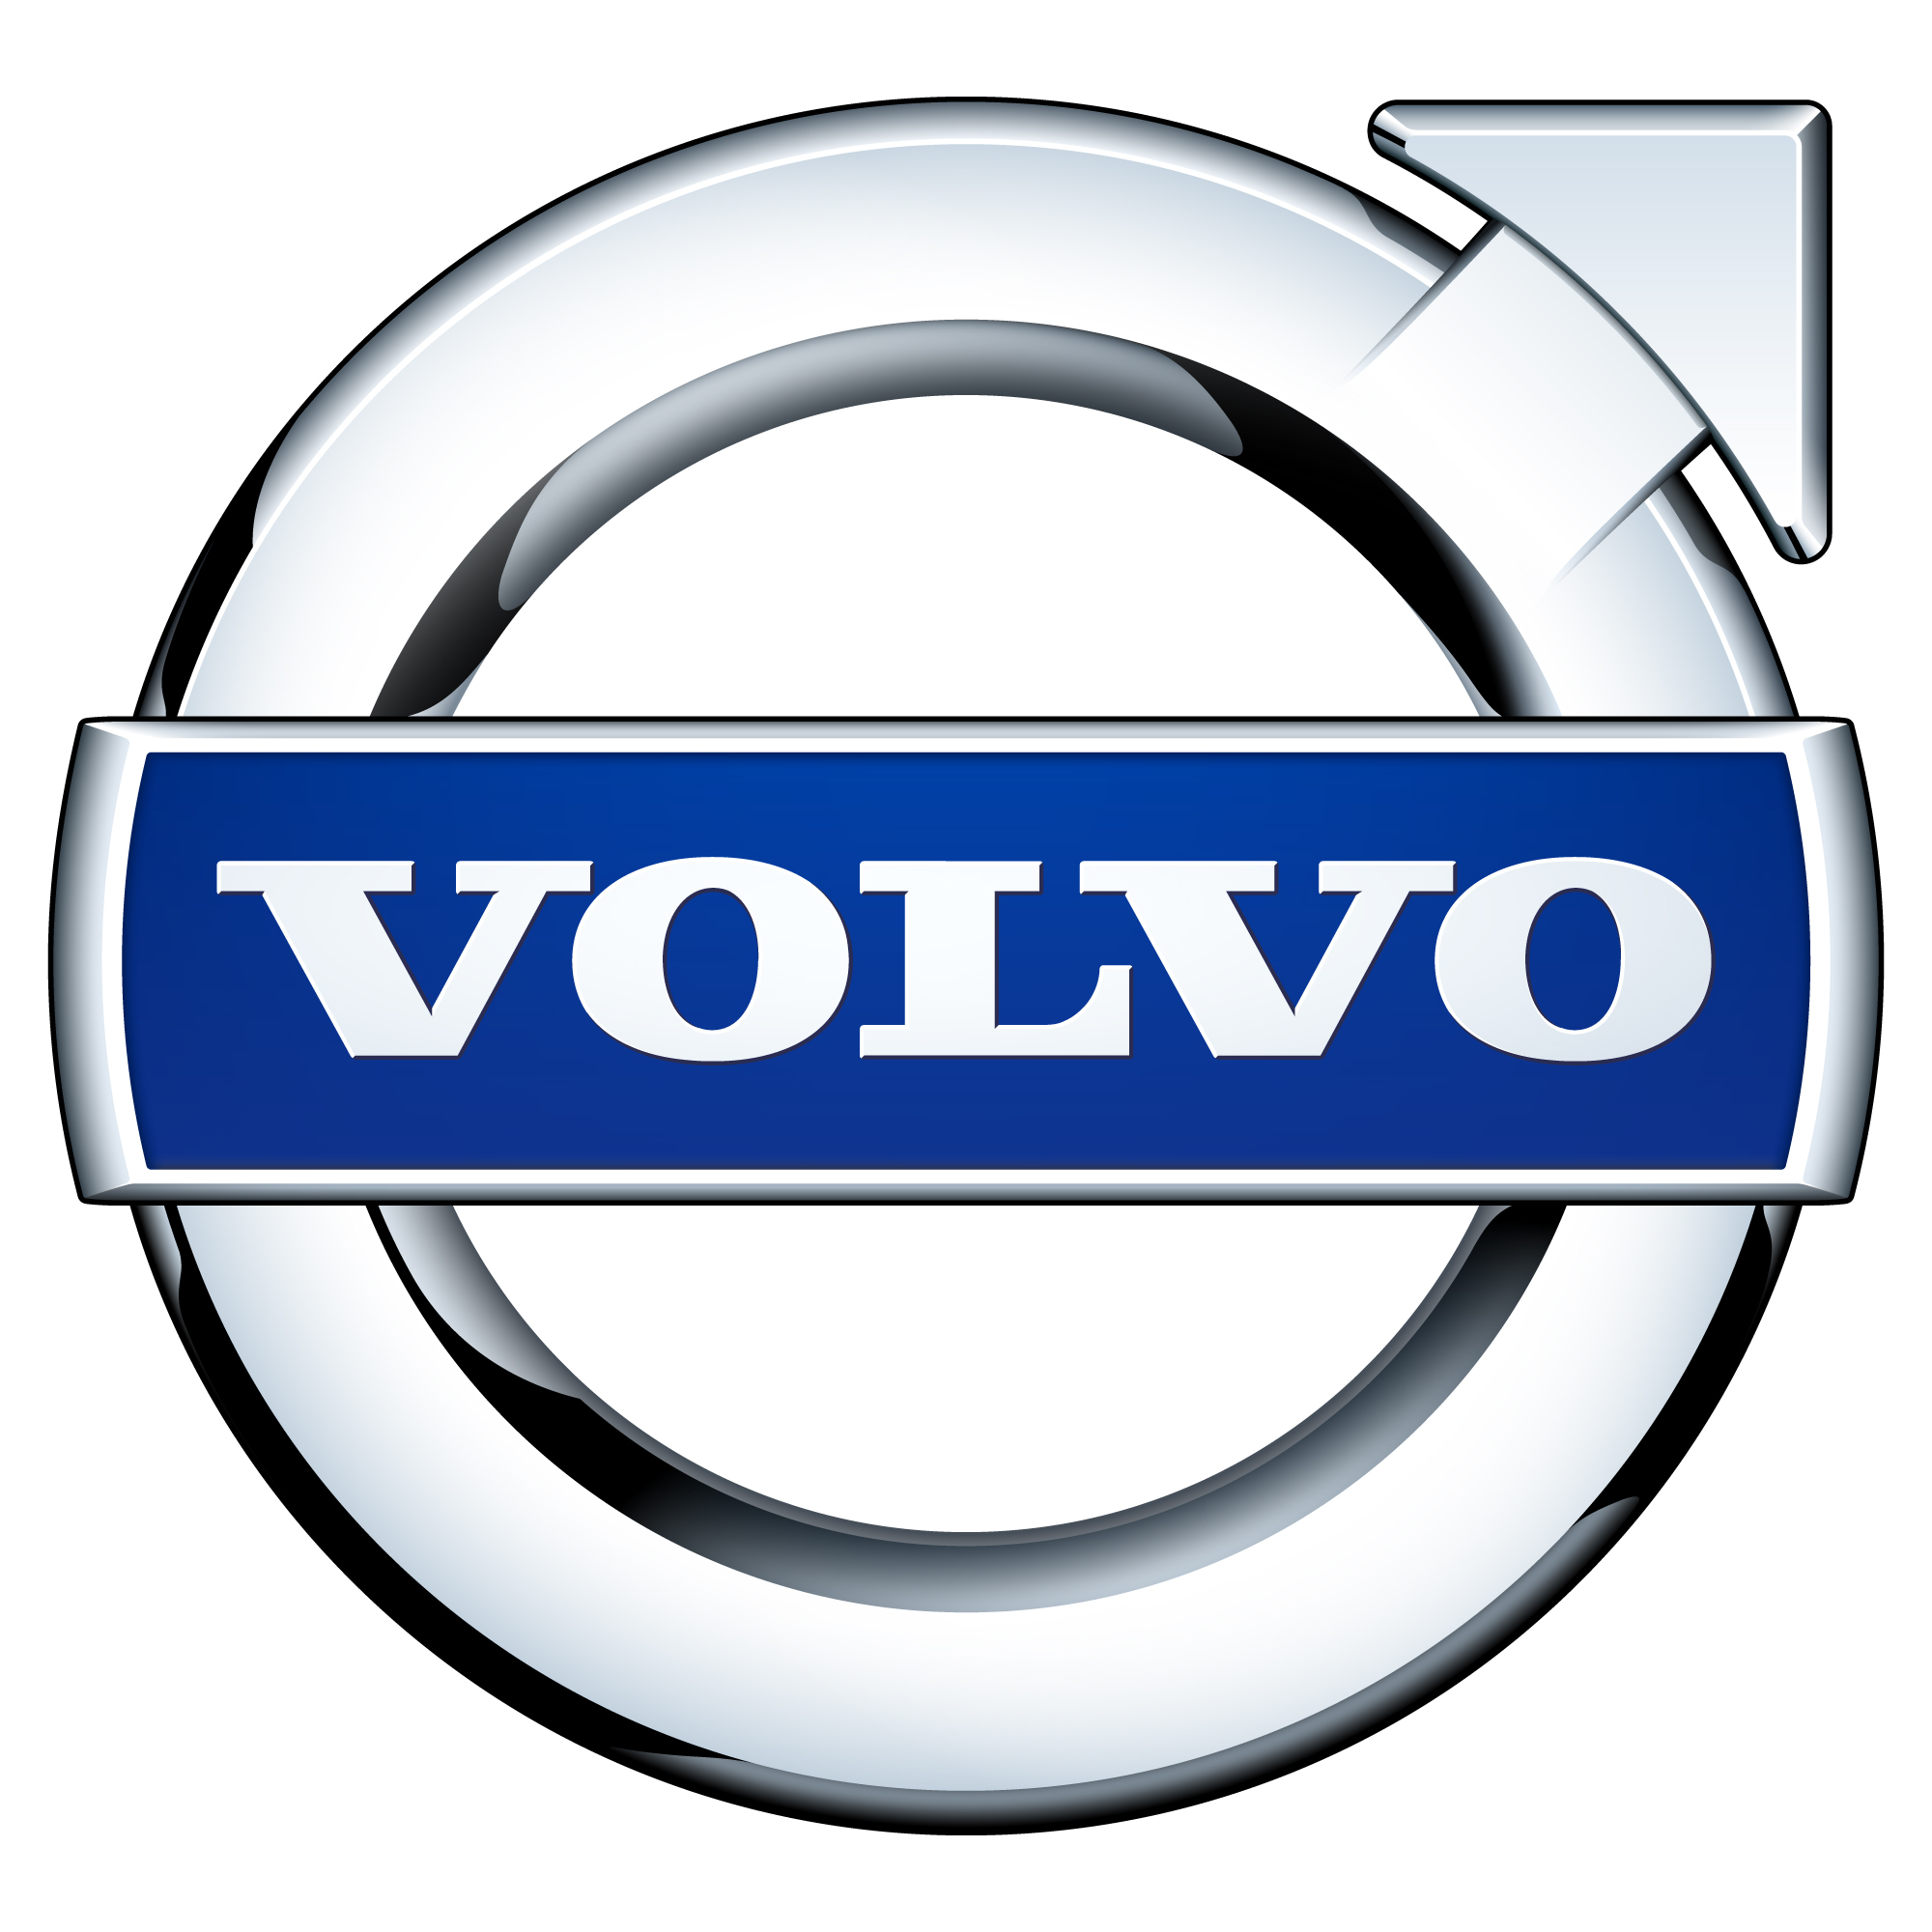 Photo of Volvo Eylül 2015 Fiyat Listesi